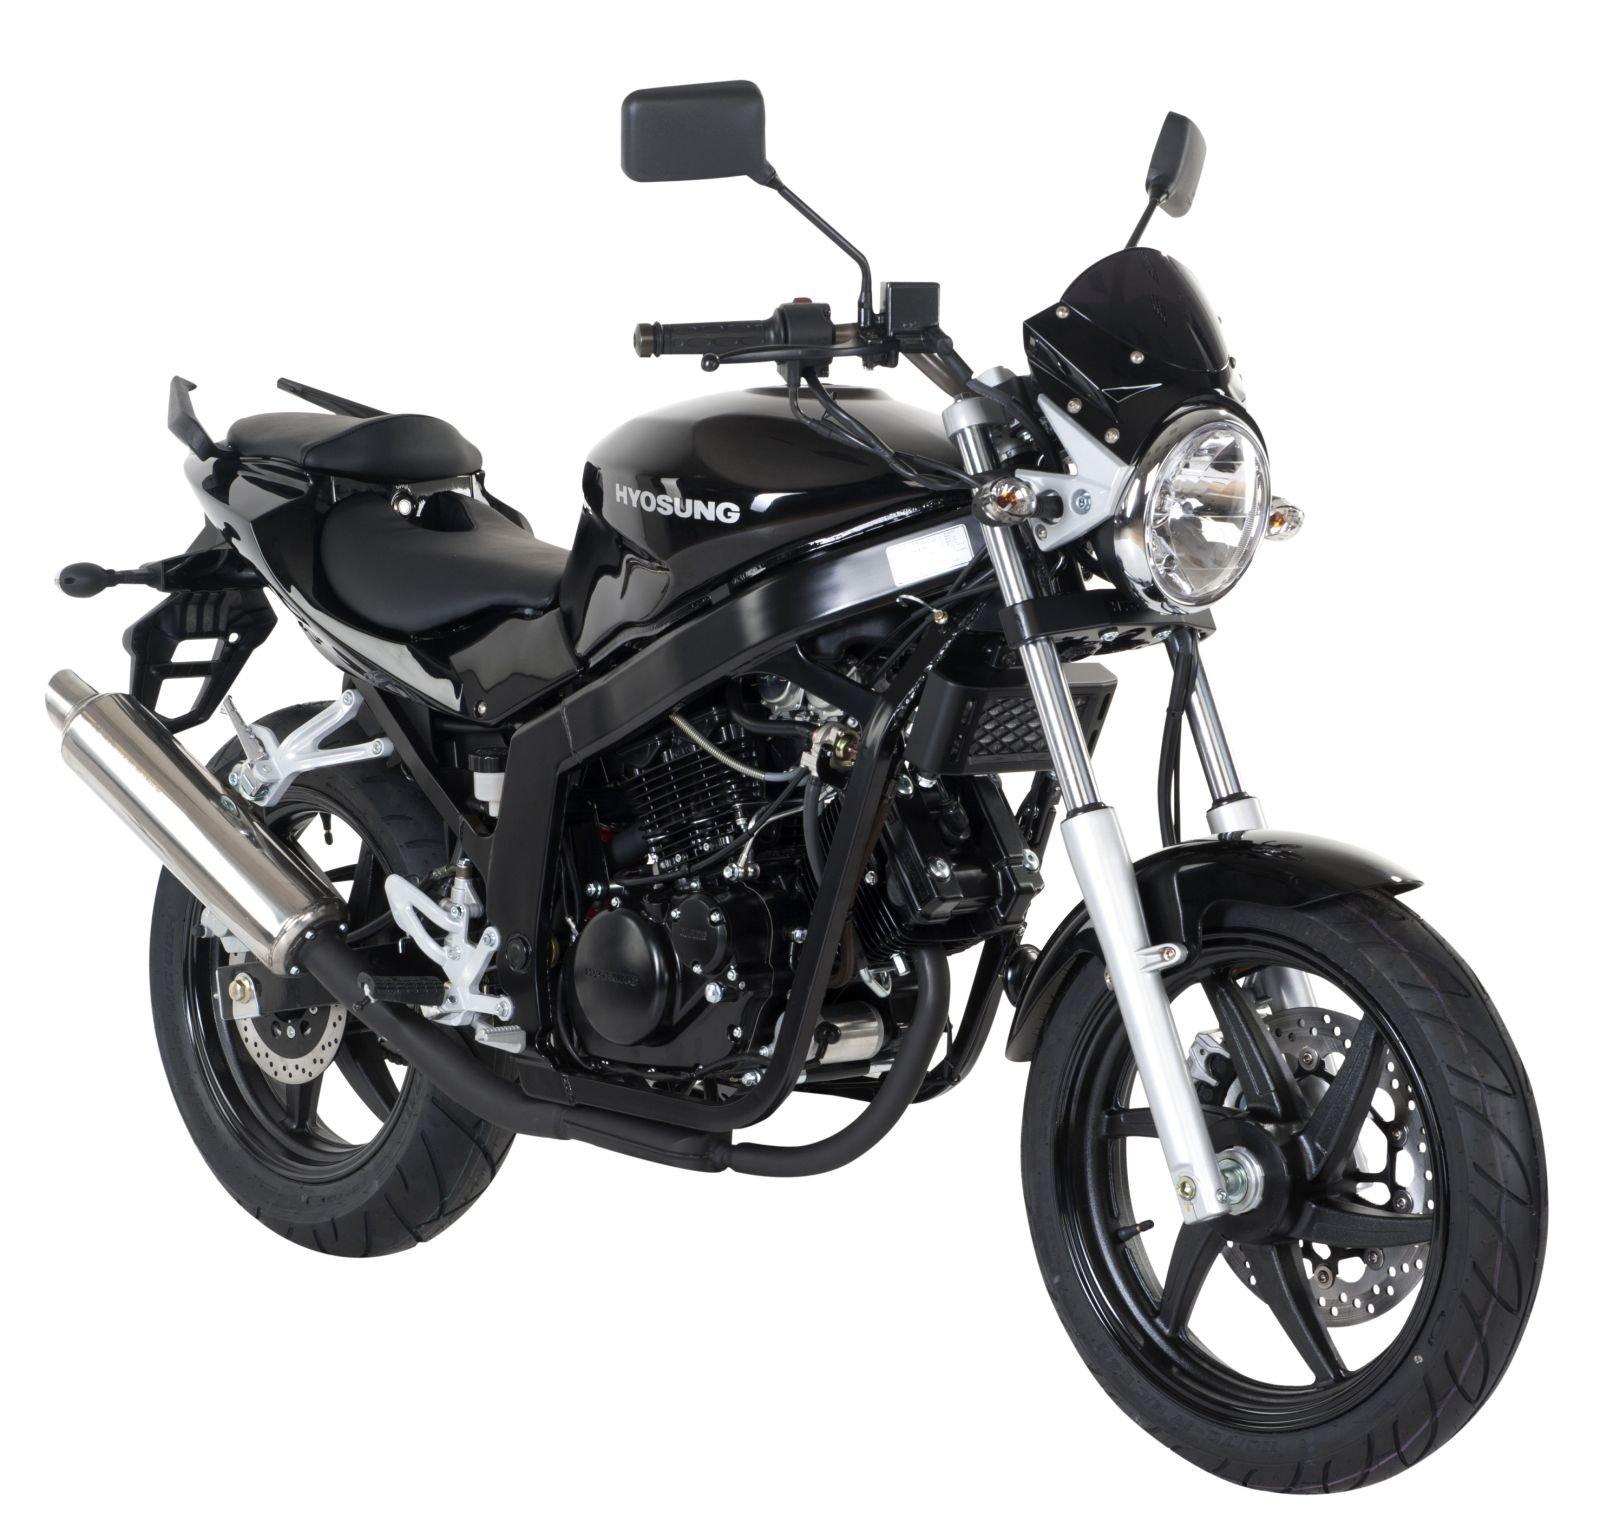 Hyosung Hyosung GT 125 Naked / GT125 Comet - Moto